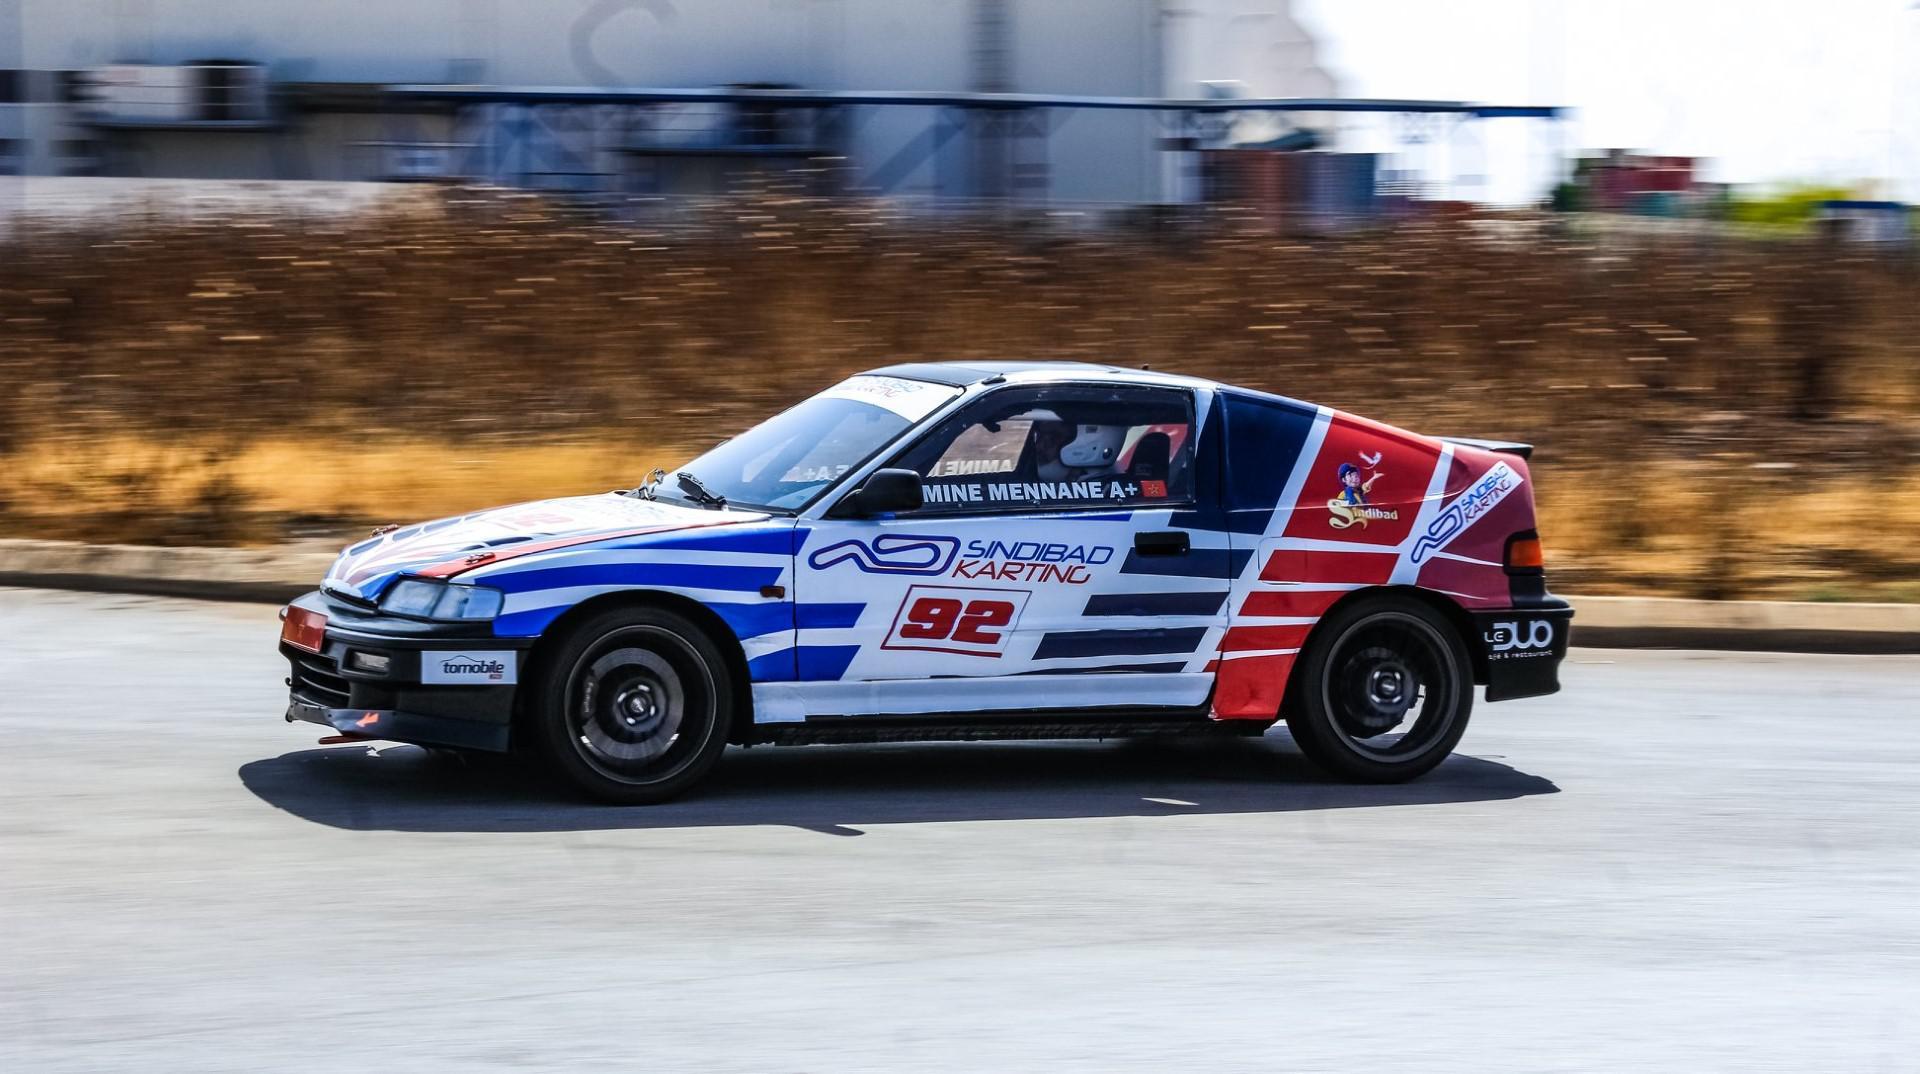 qui-sont-team-am-racing-1043-4.jpg